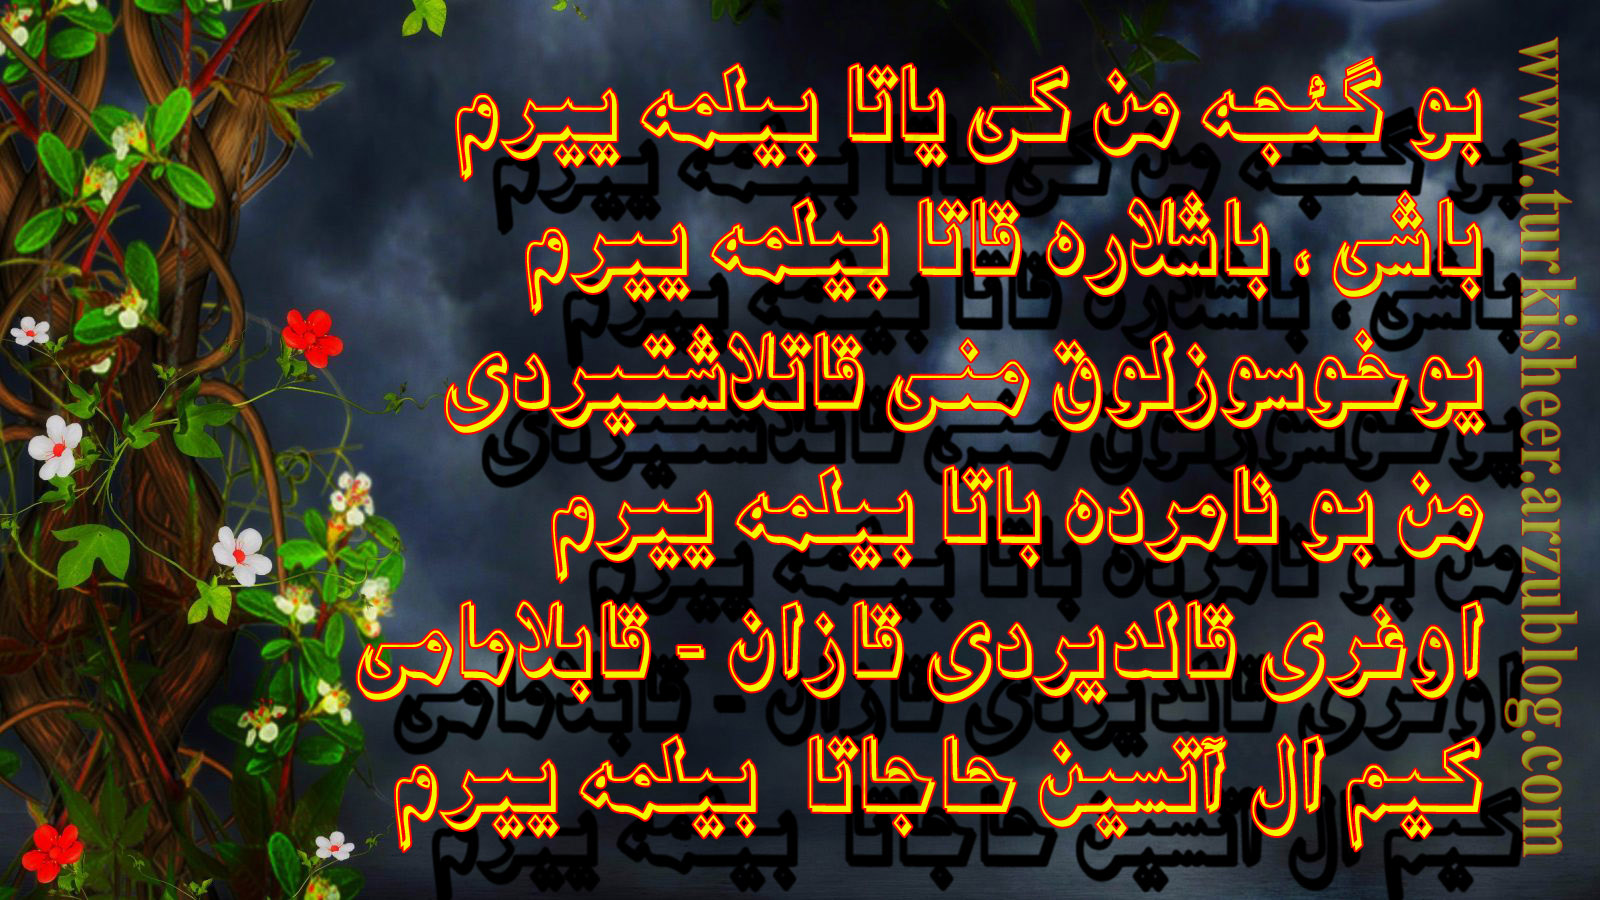 http://turkisheer.arzublog.com/uploads/turkisheer/txt_shahryar1.jpg